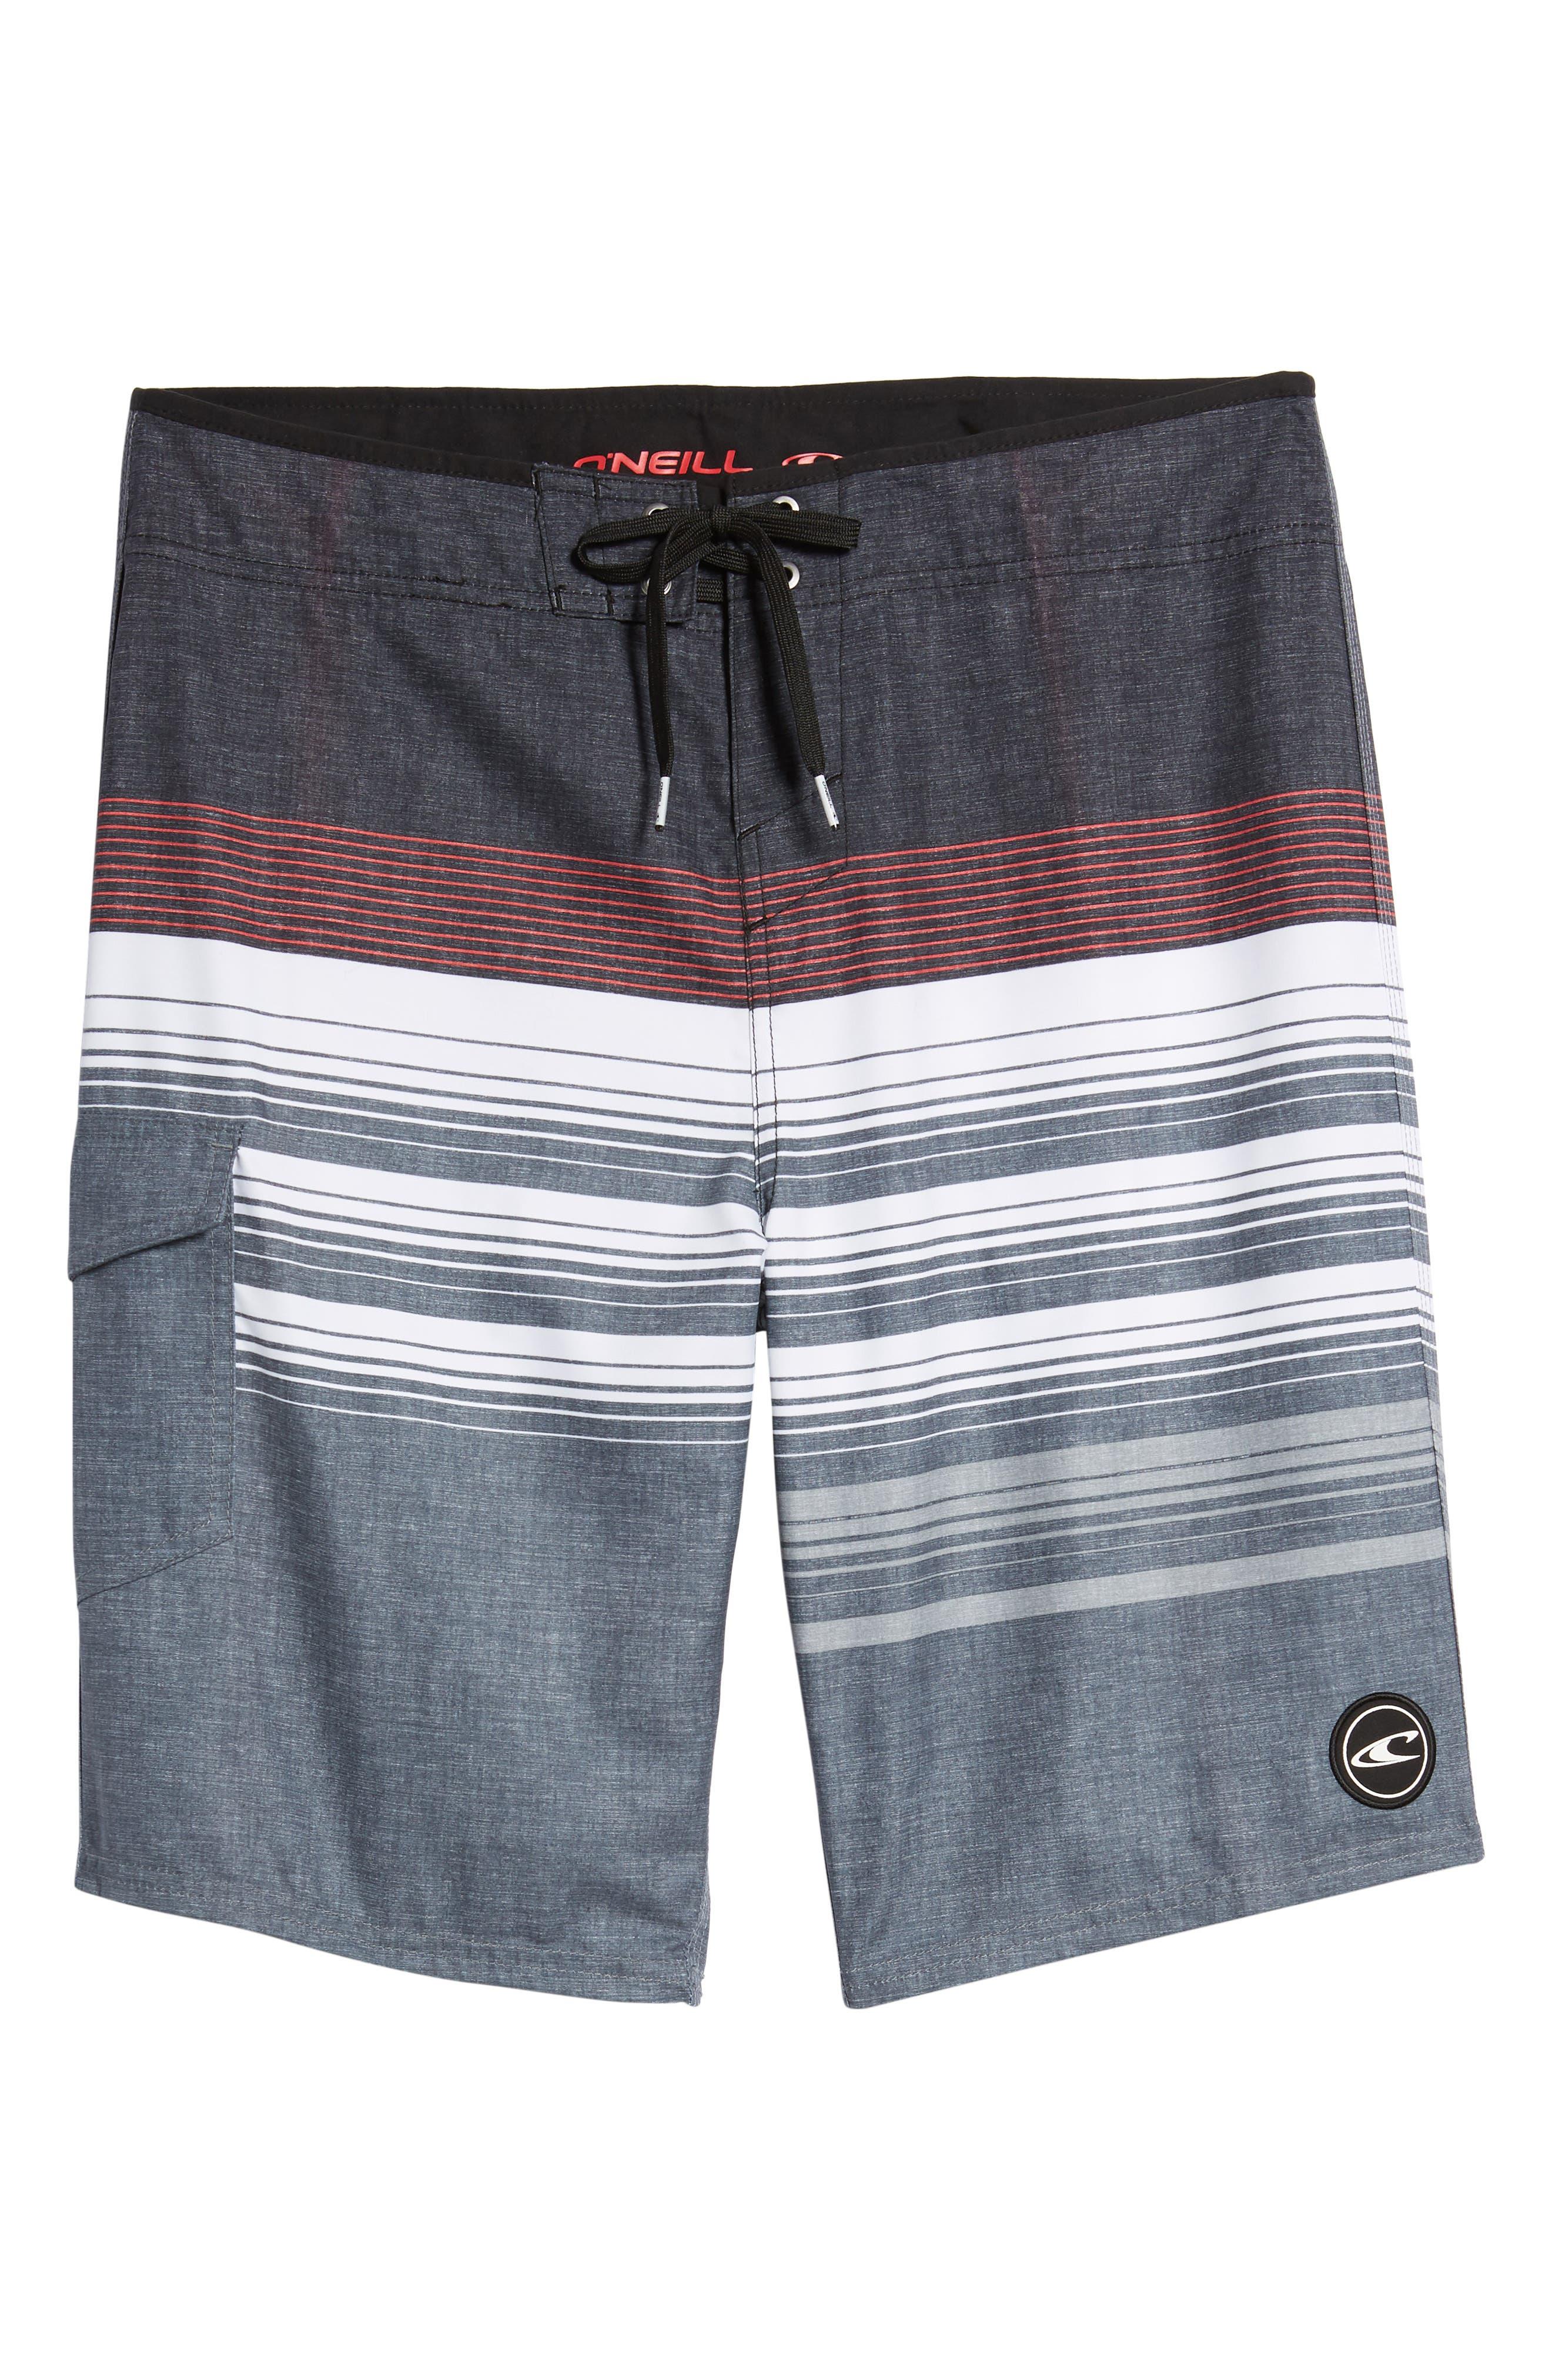 Lennox Board Shorts,                             Alternate thumbnail 6, color,                             020